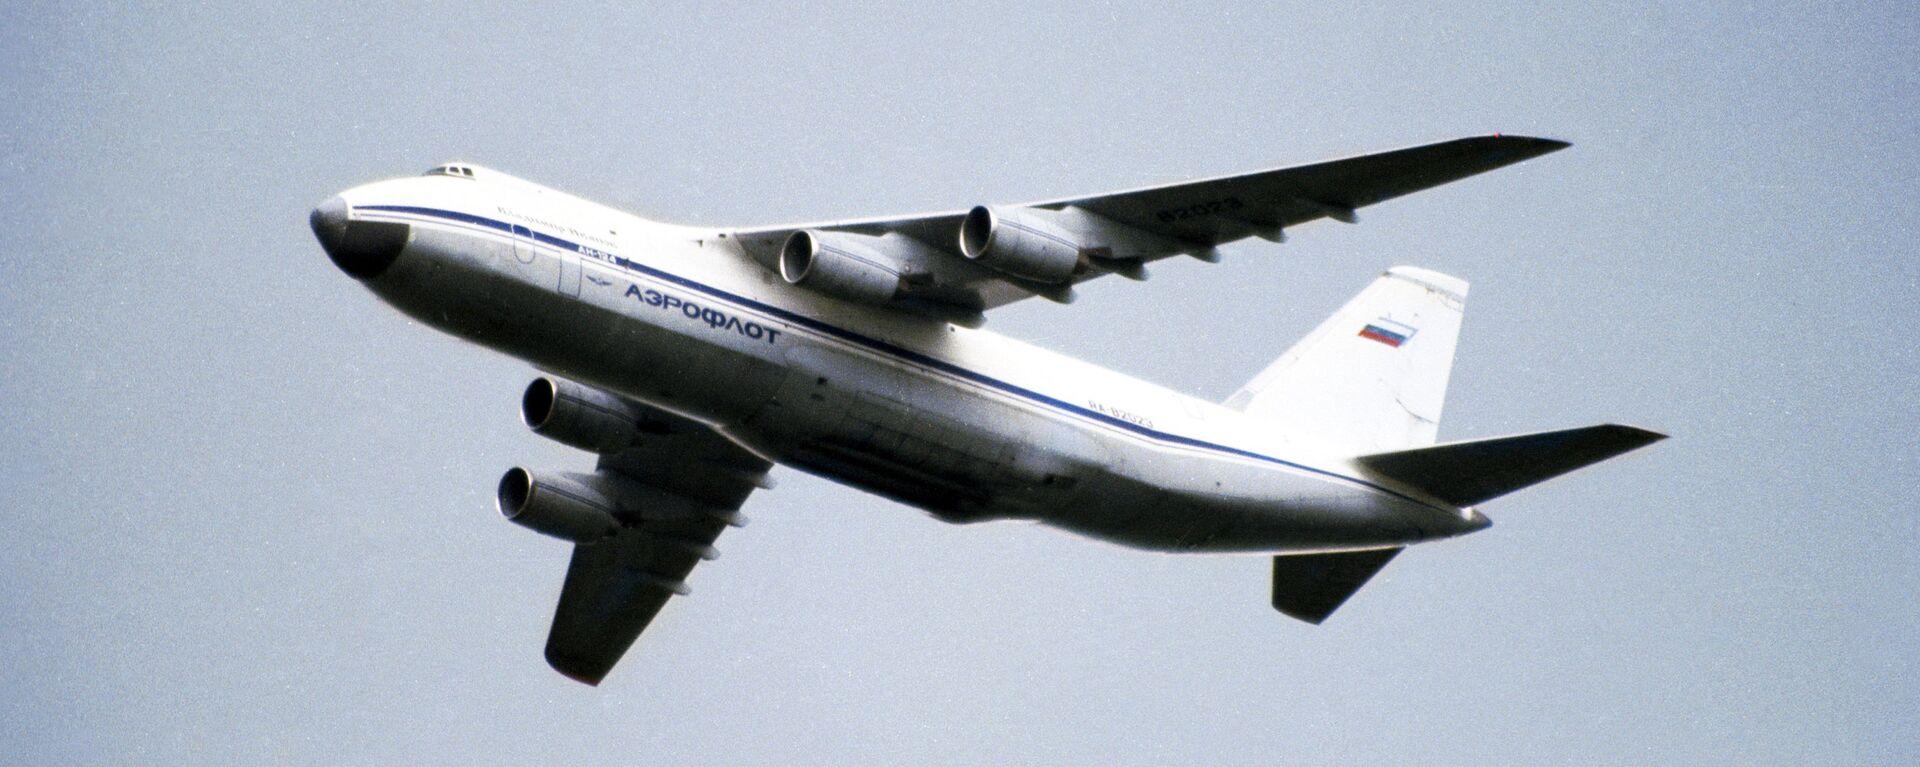 Avión de transporte ruso An-124 Ruslan - Sputnik Mundo, 1920, 26.07.2021